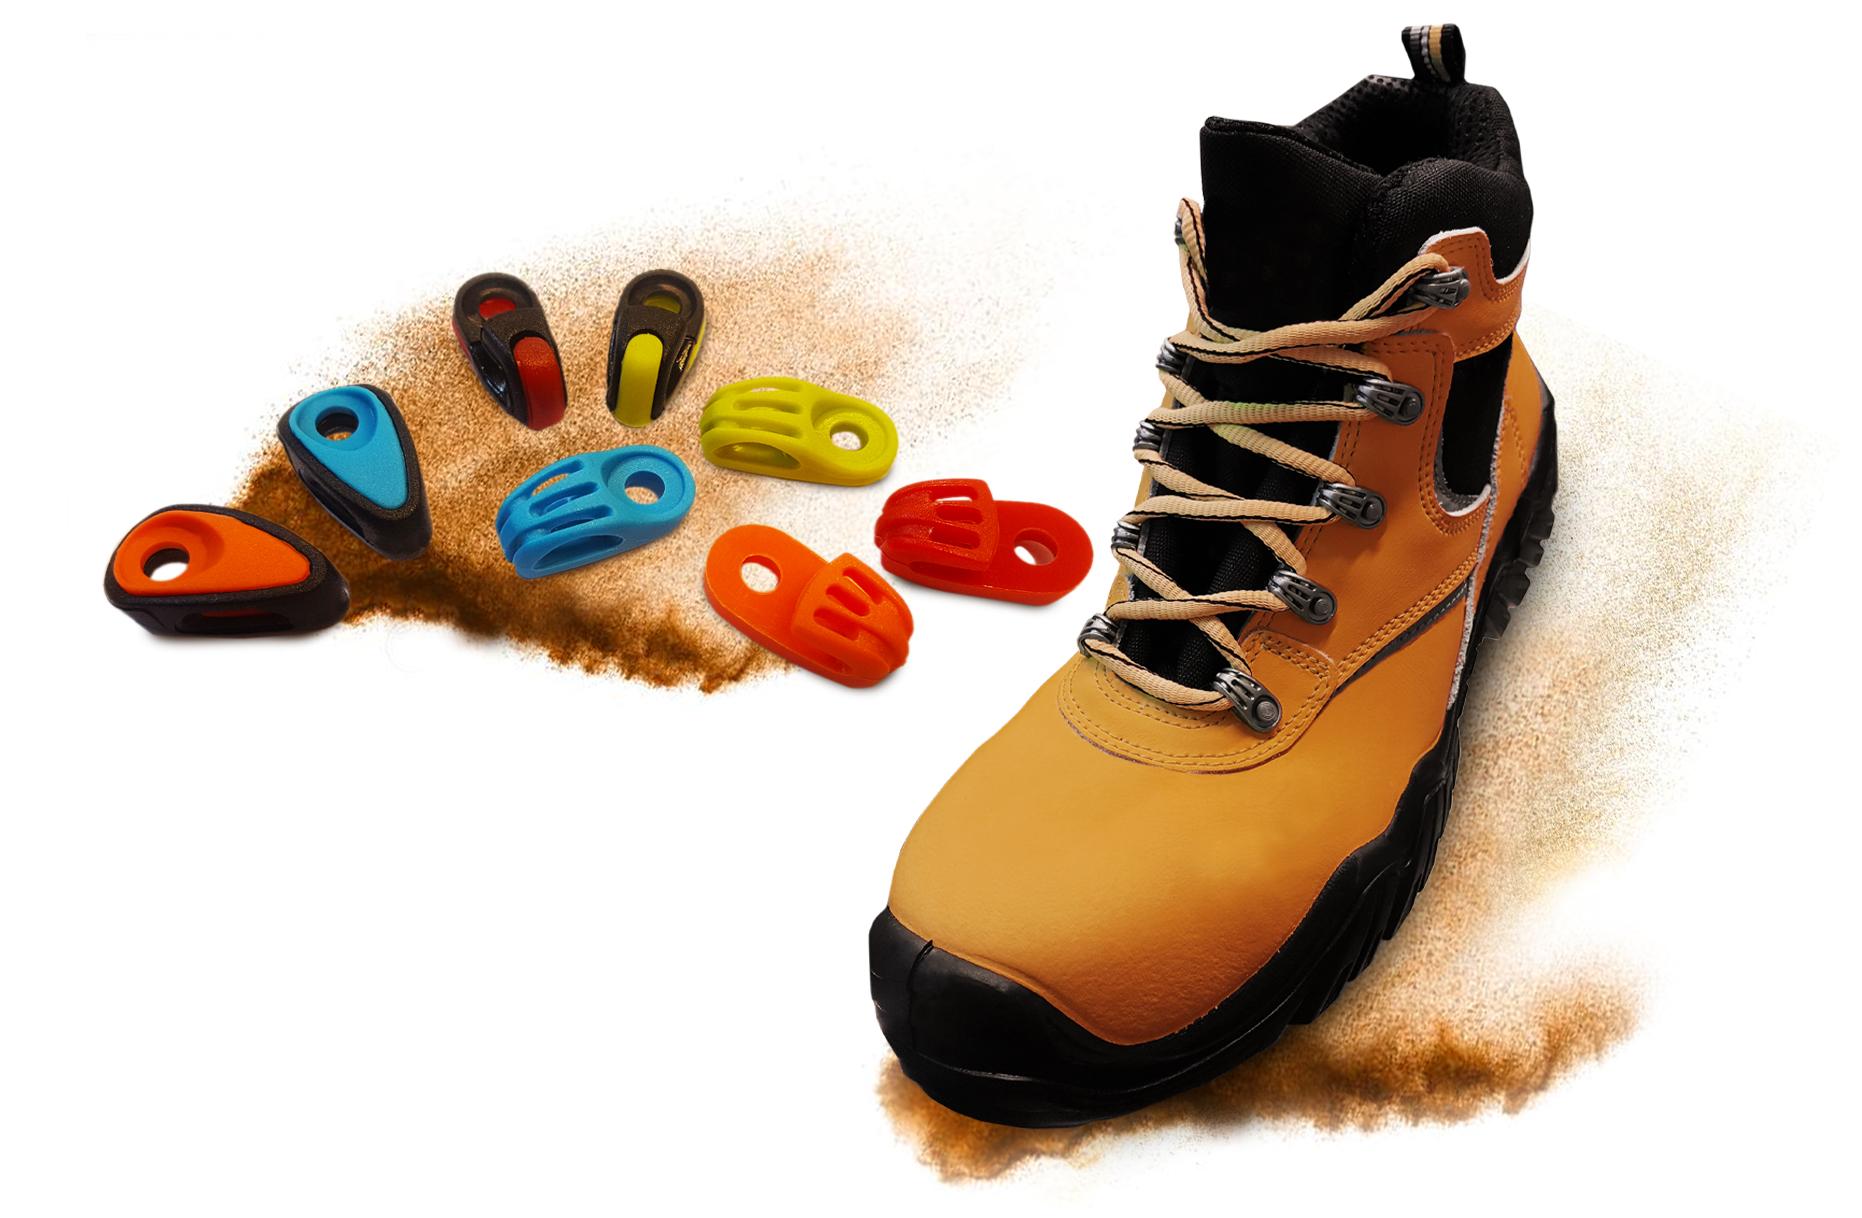 ganci passalacci occhielli metal free per scarpe antinfortunistiche metal free eyelets eyelets hooks for safety shoes